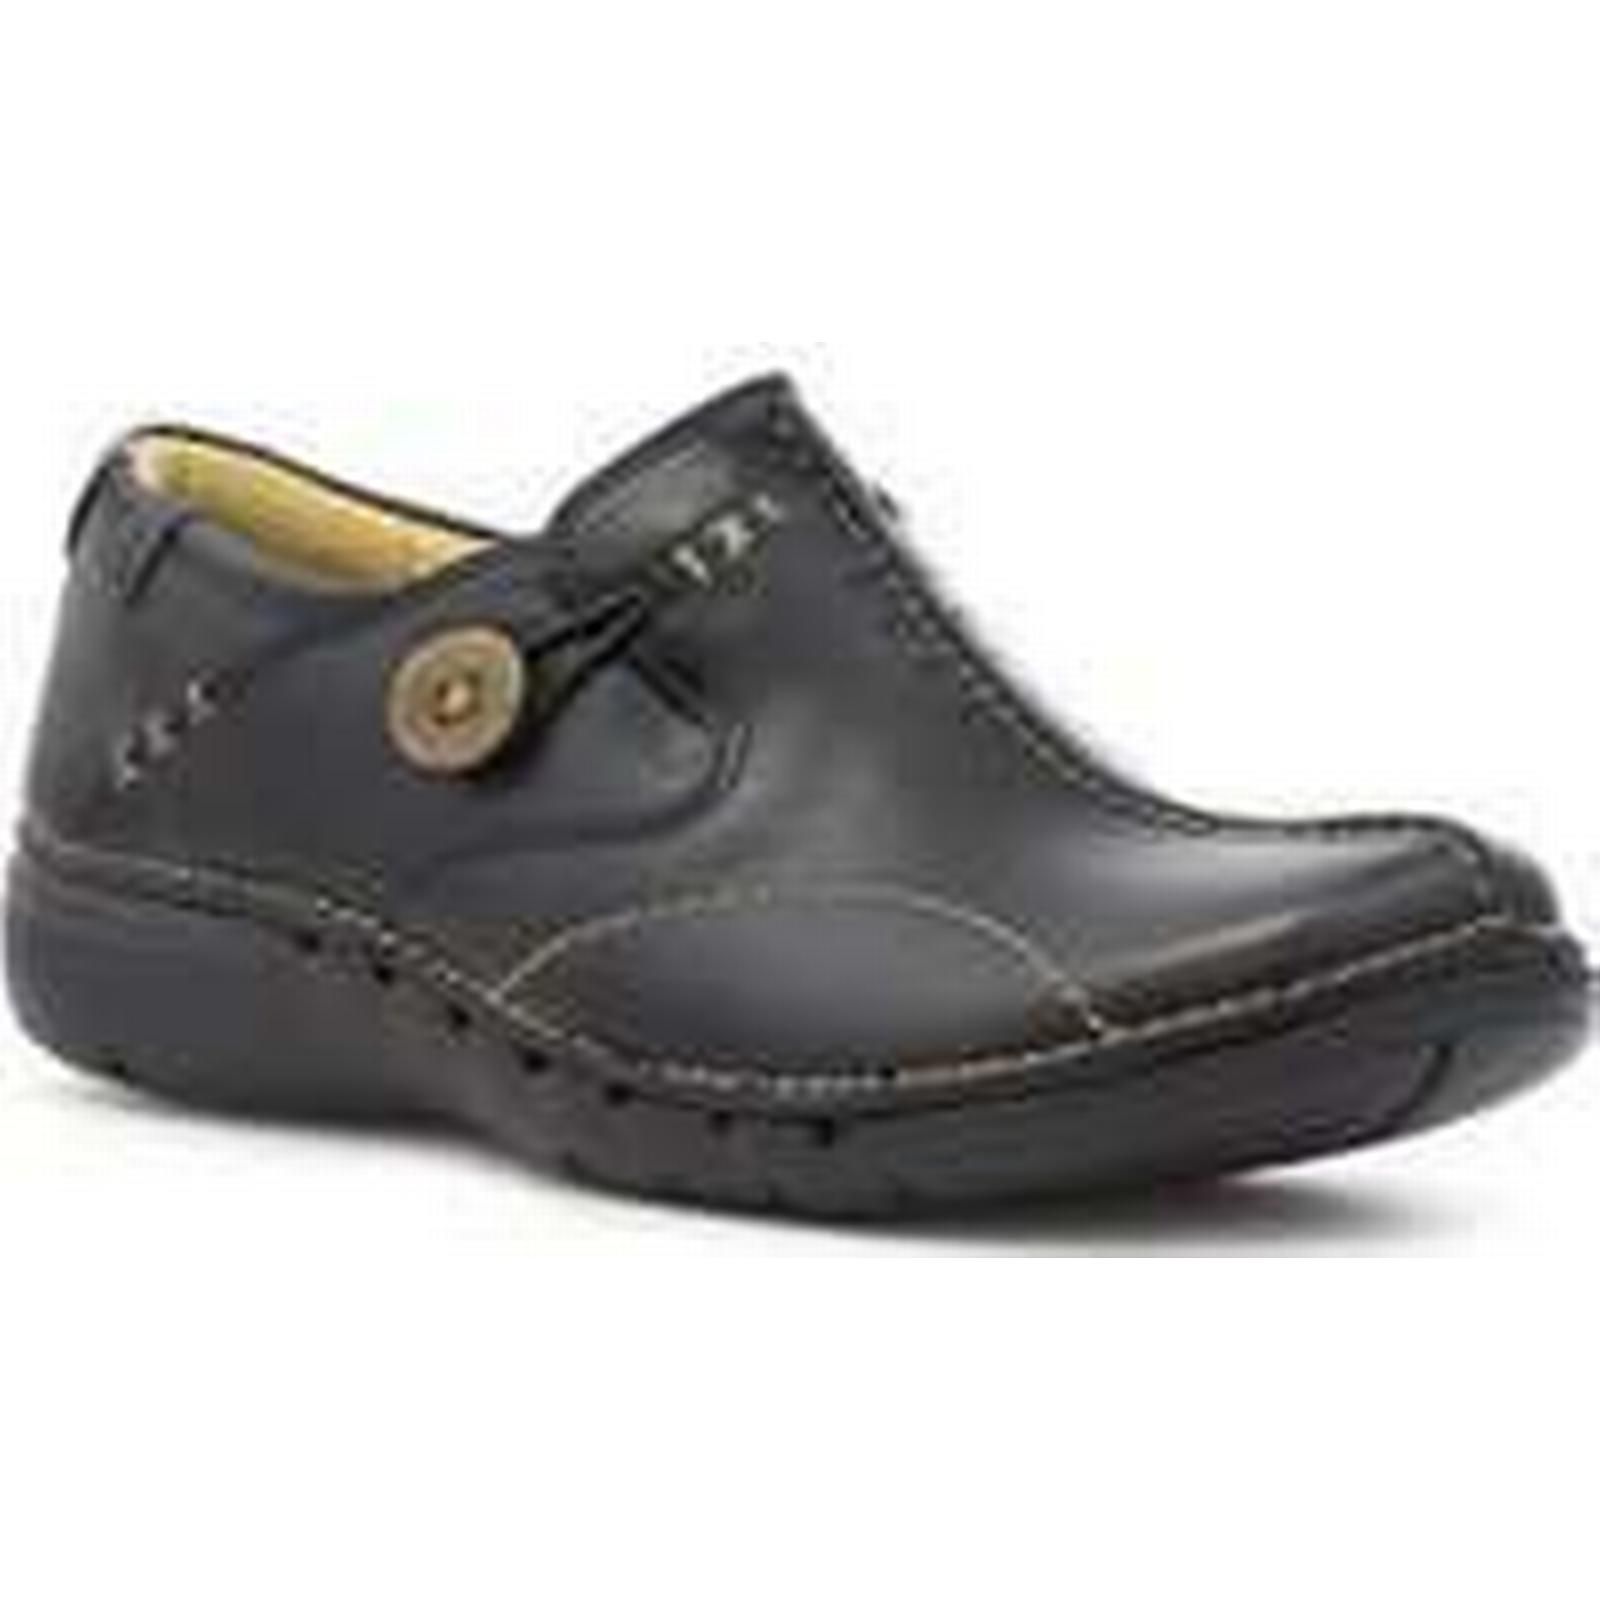 Clarks Womens Black Leather Slip On On Slip Casual Shoe 486519